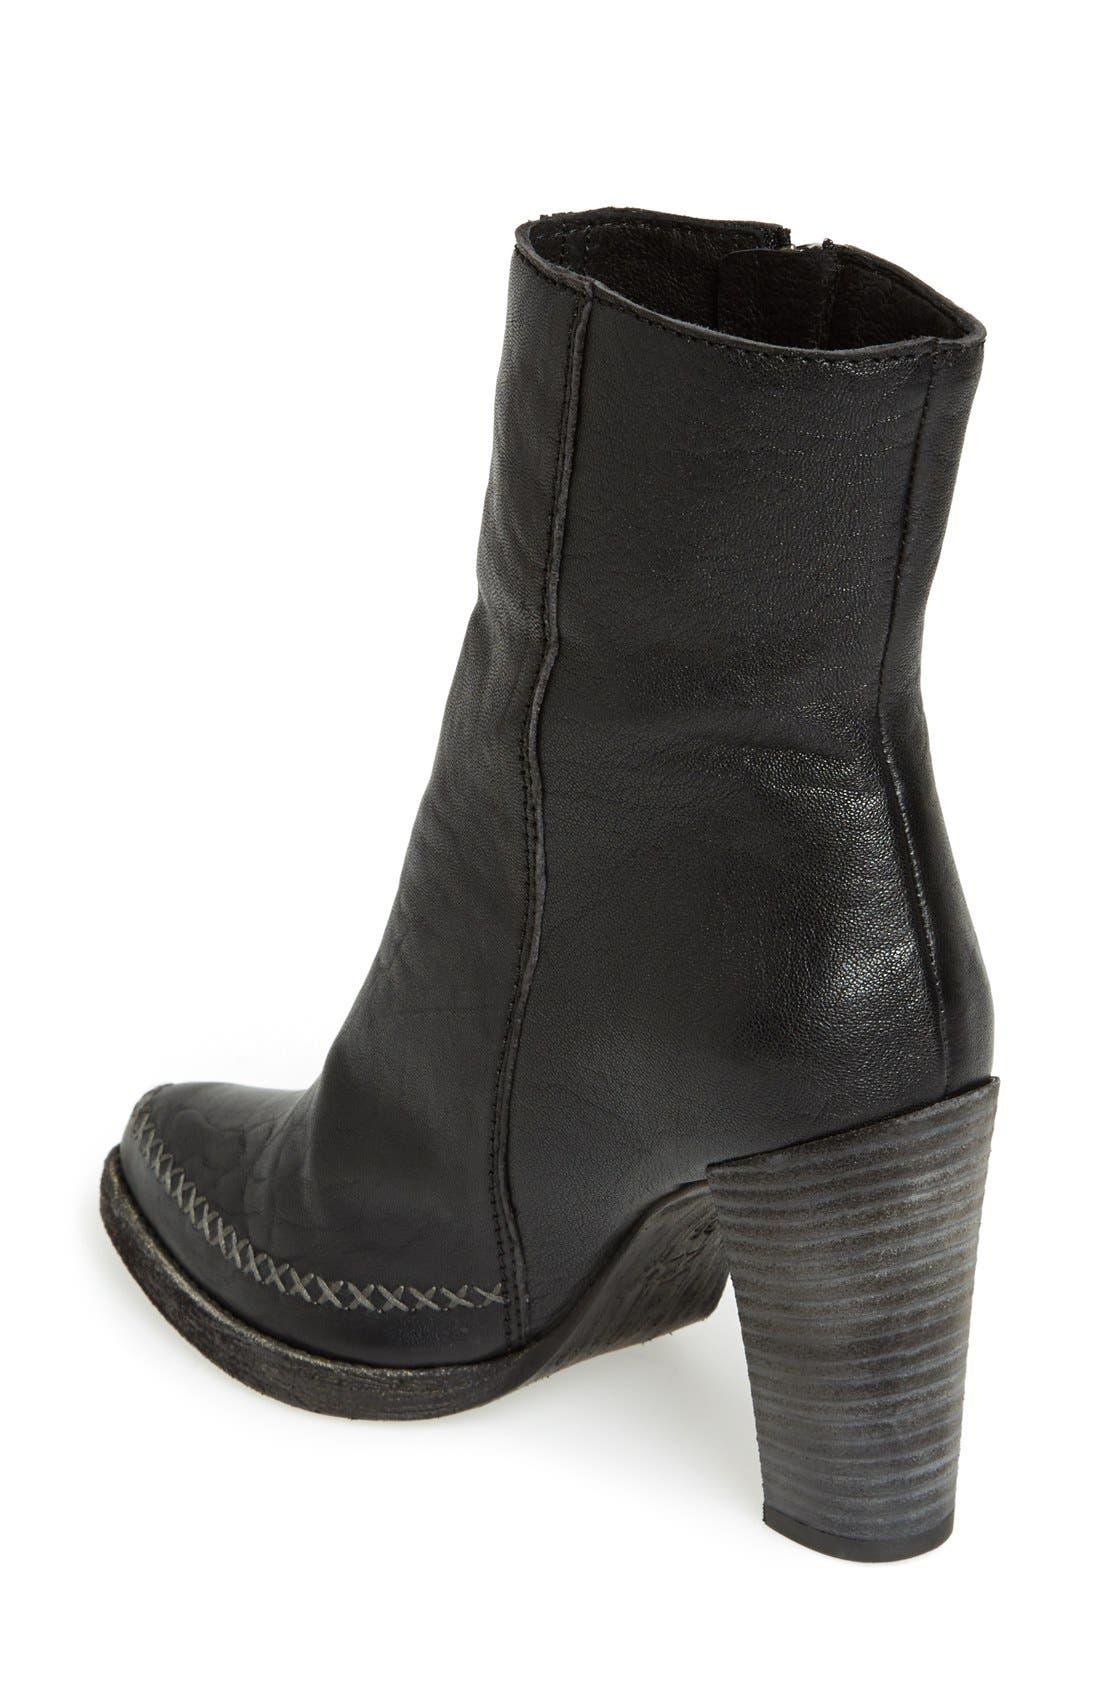 Alternate Image 2  - Free People 'Baroness' Side Zip Boot (Women)